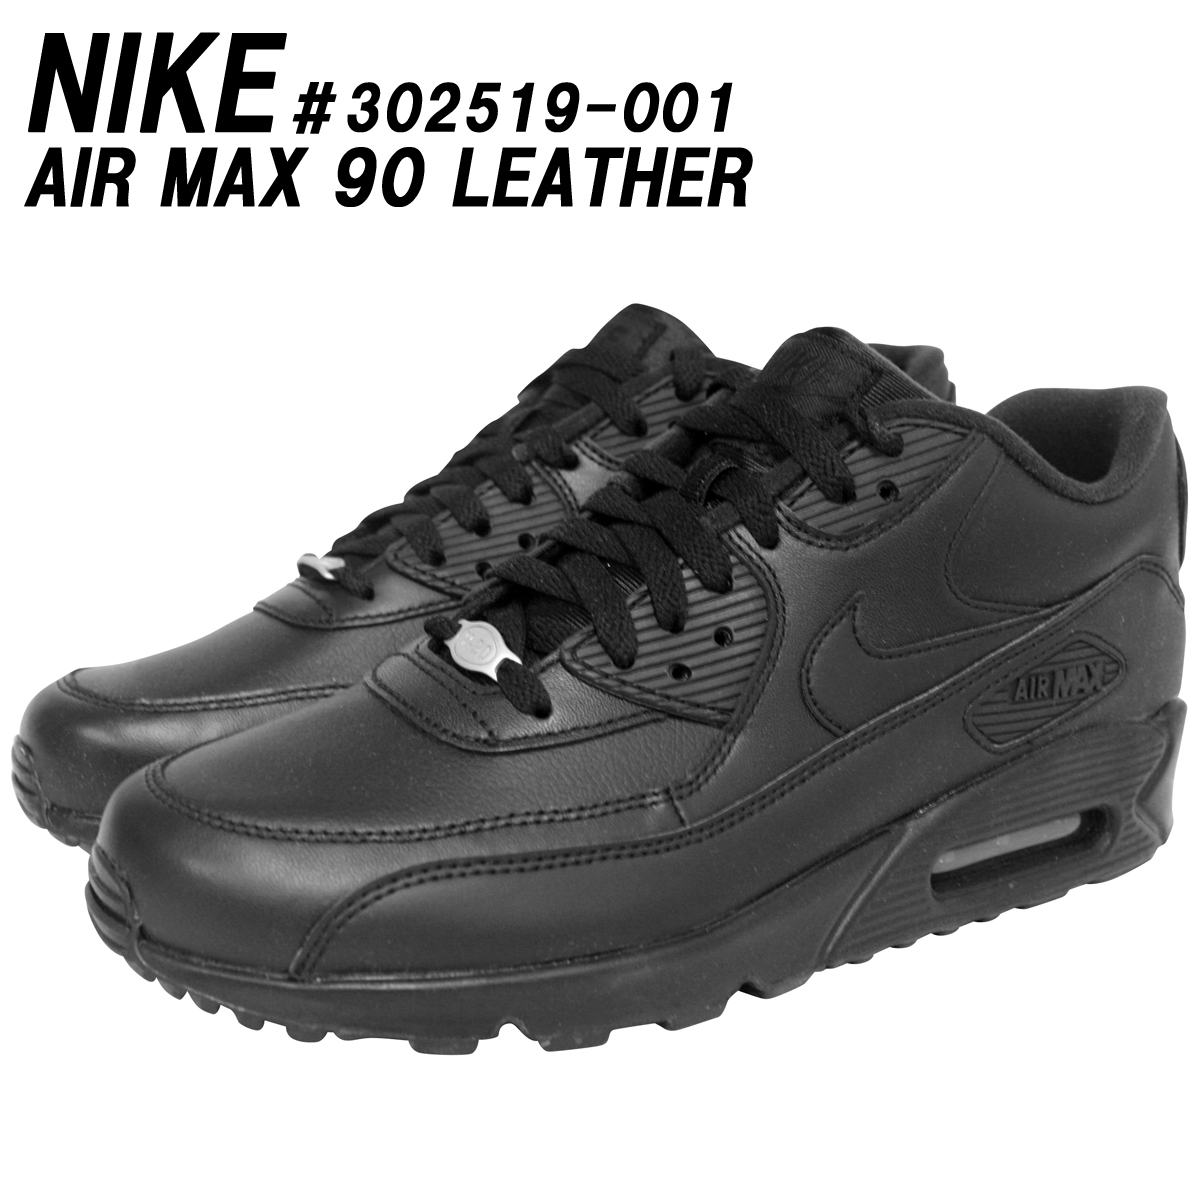 NIKE AIR MAX 90 LEATHERナイキ マックス 90 レザー BLACKカラー302519-001サイズ交換片道無料★【あす楽対応_関東】